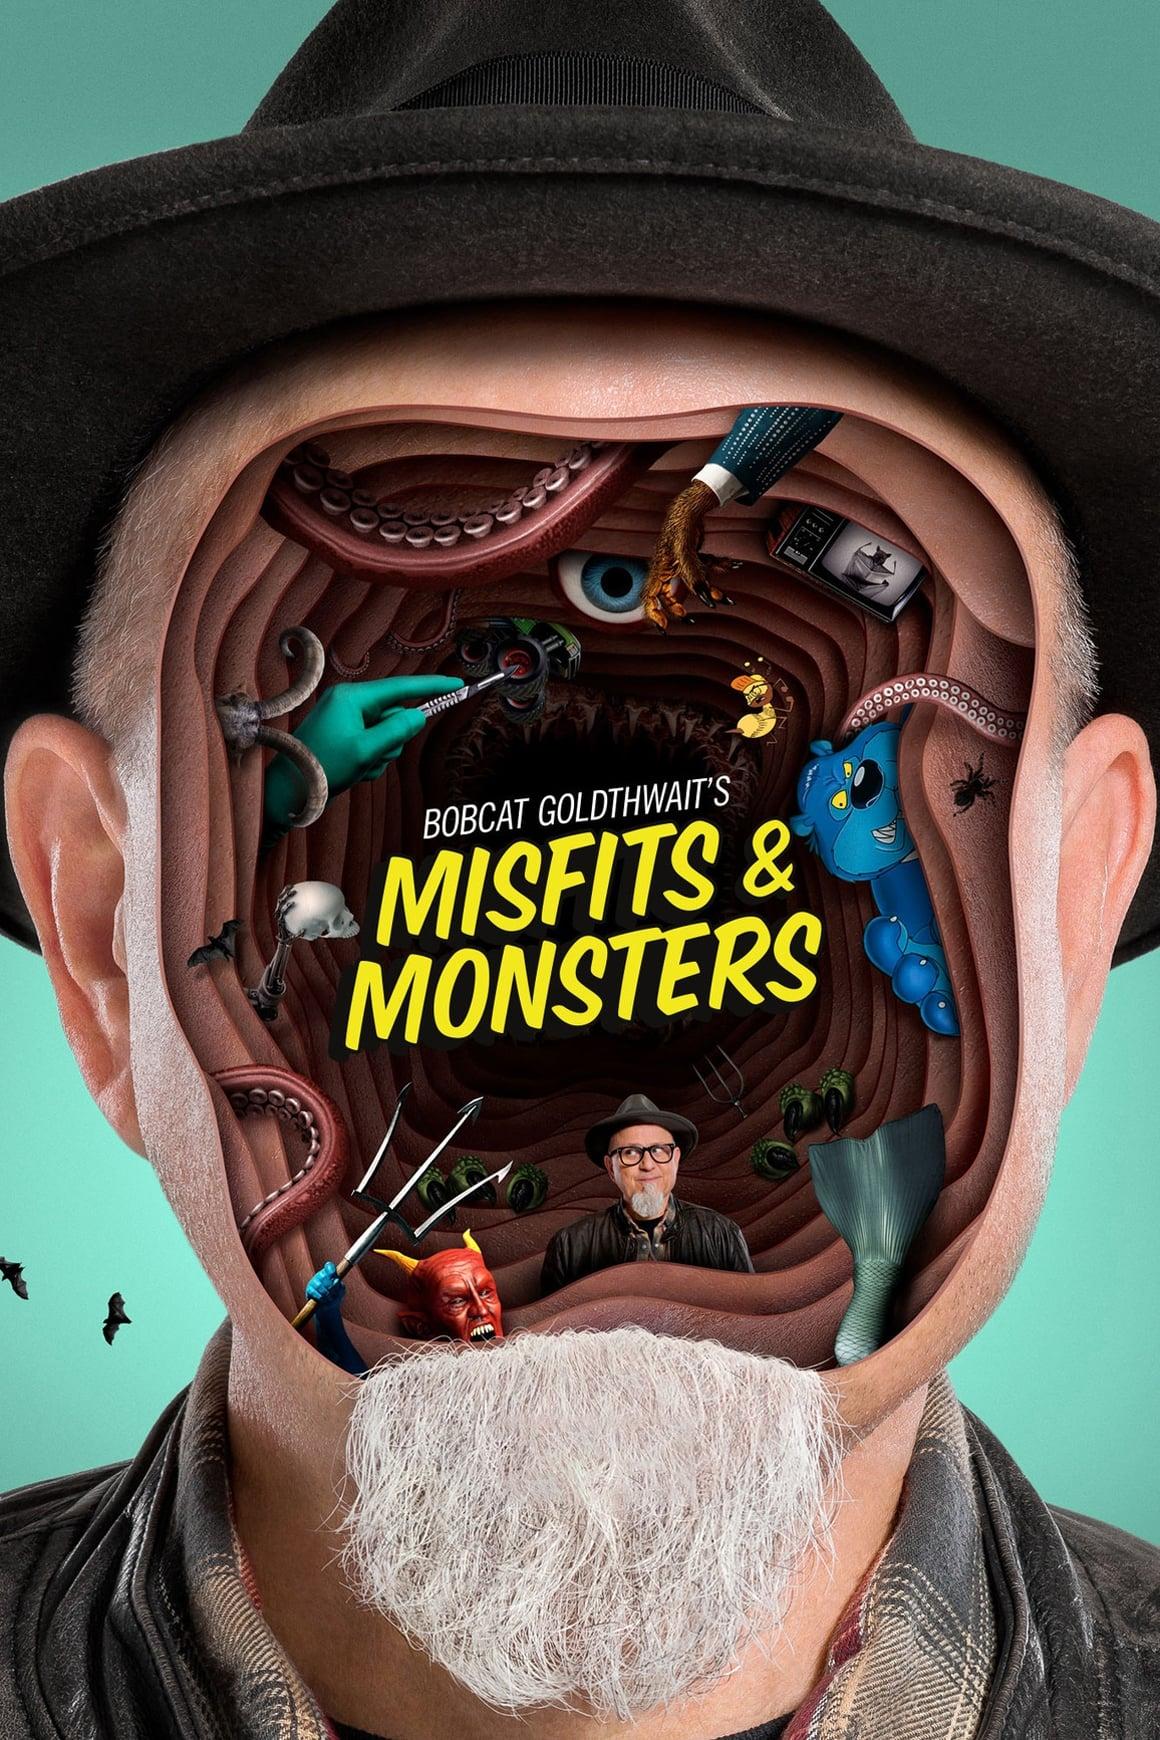 Bobcat Goldthwait's Misfits & Monsters series tv complet